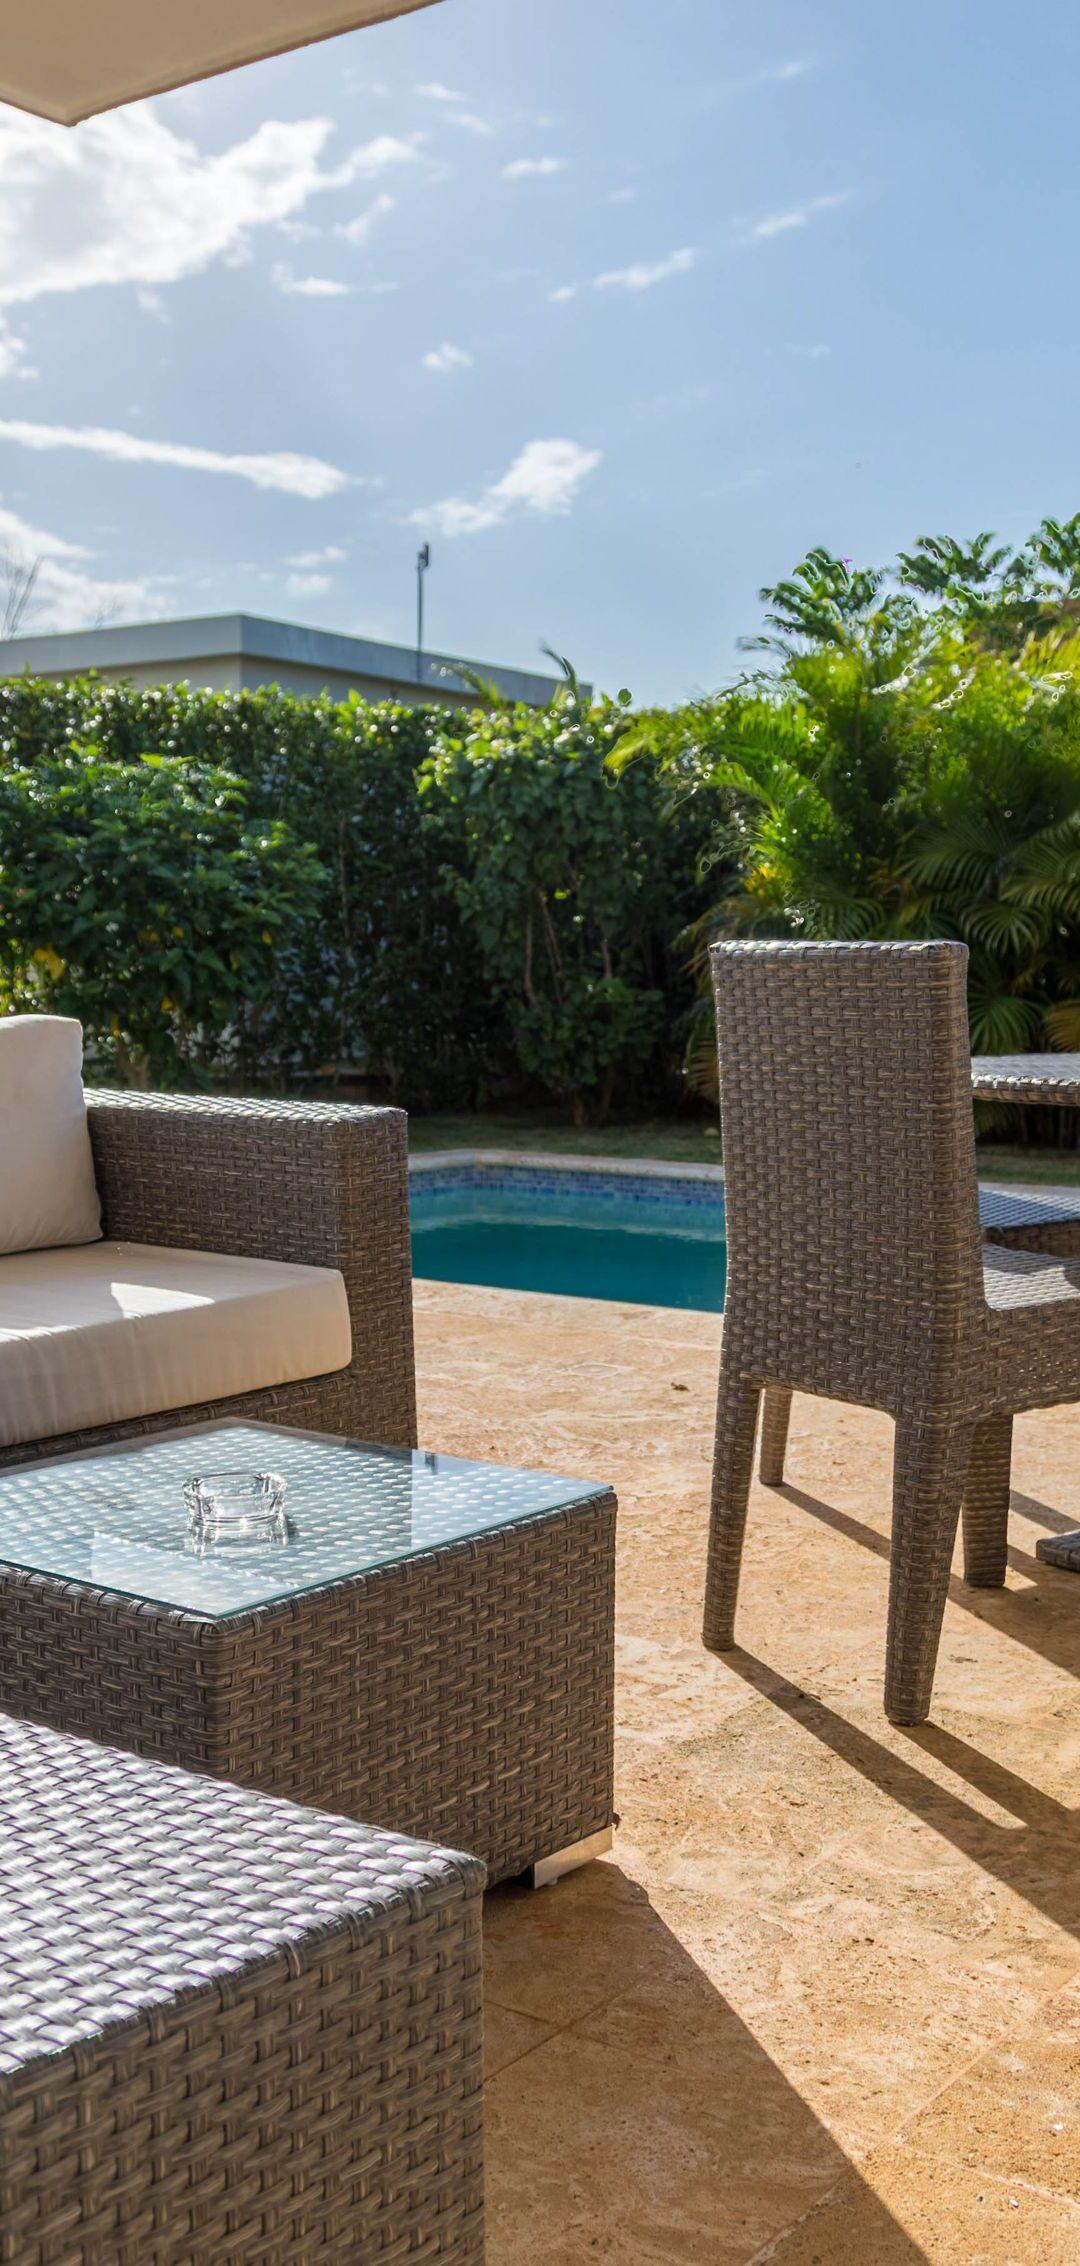 Luxury Tropical Villas in The Dominican Republic